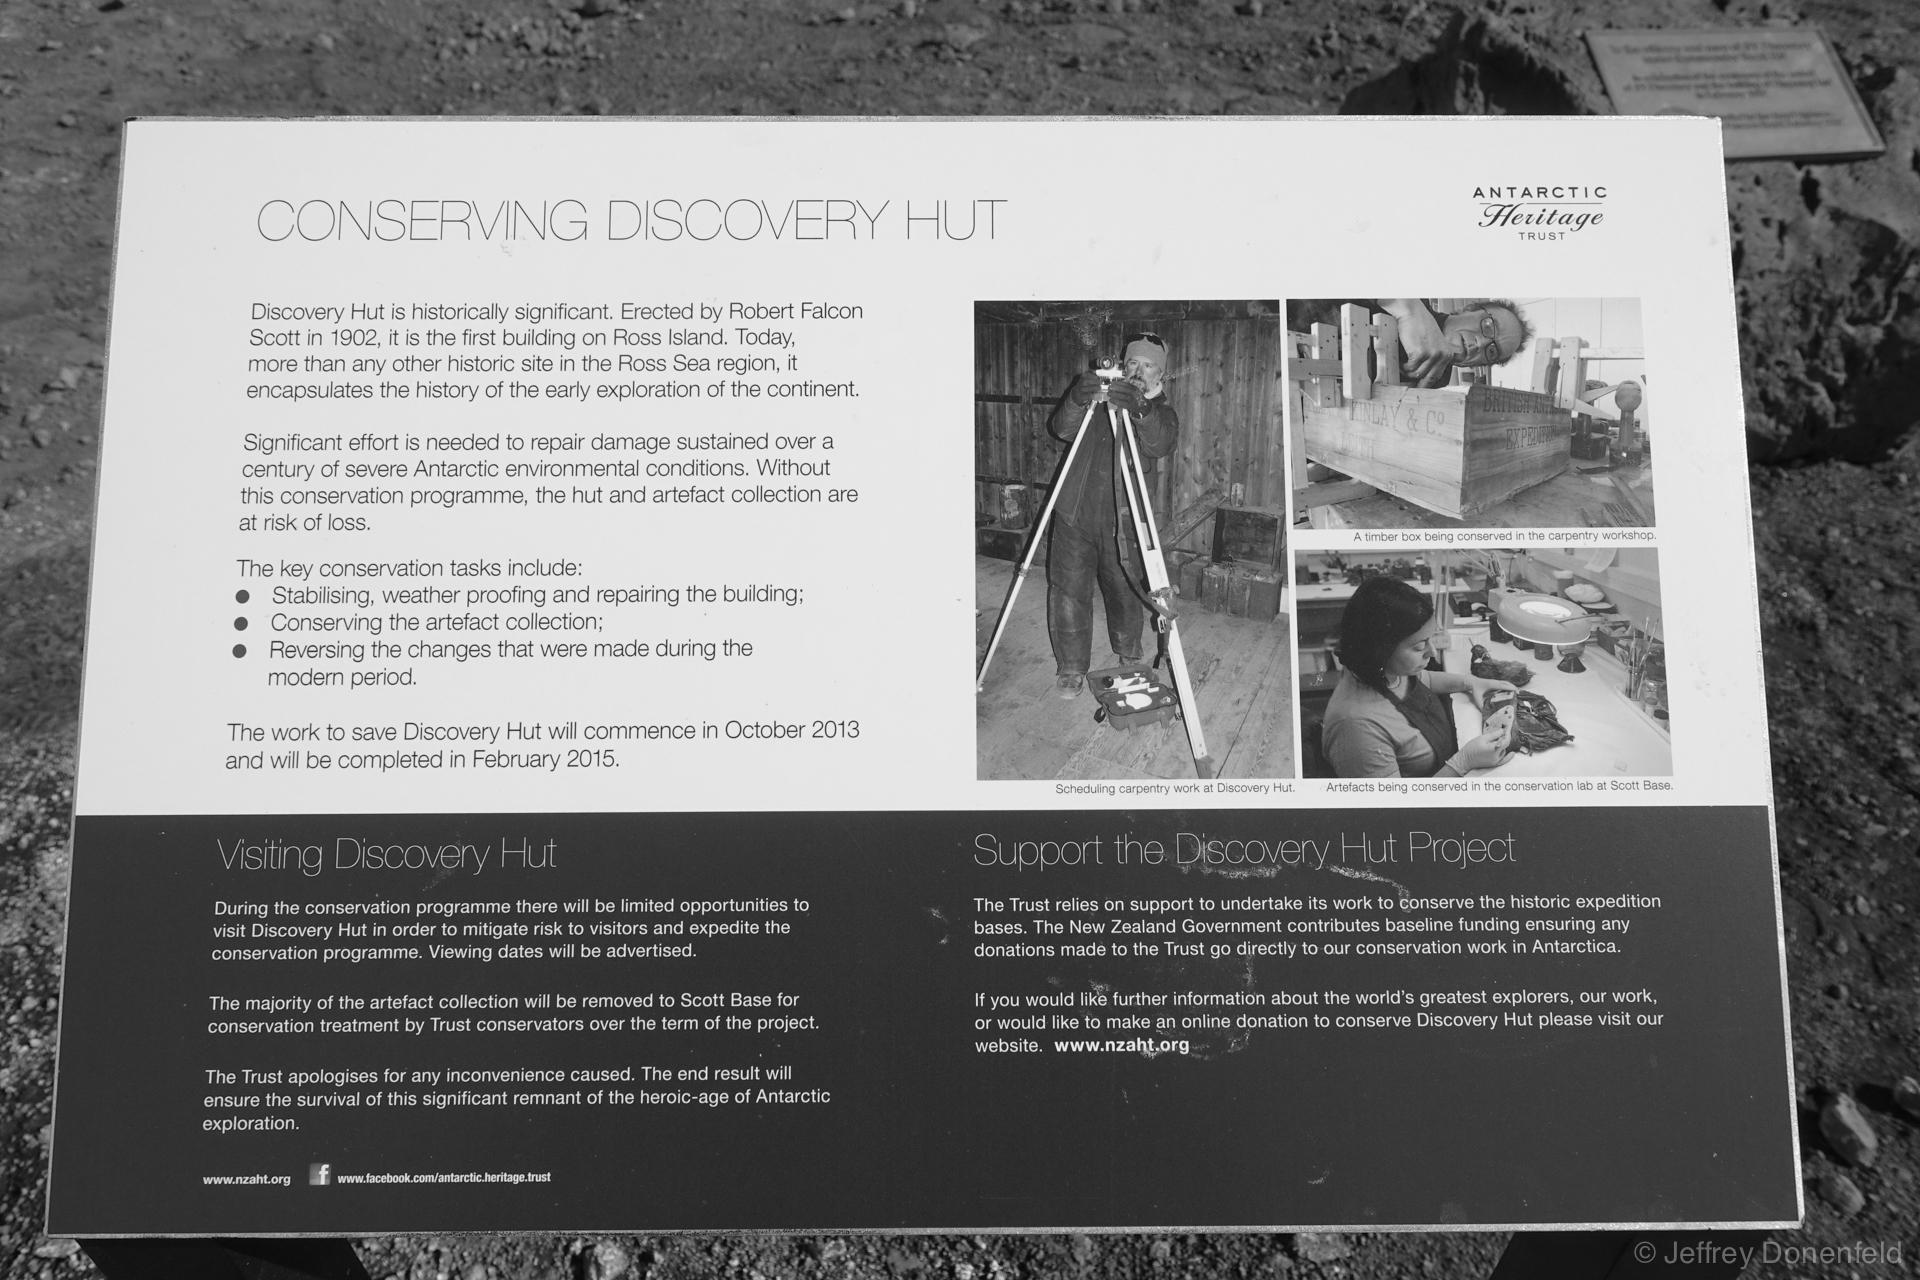 DSC00984-2014-12-12 Discovery Hut-Donenfeld-1920-WM